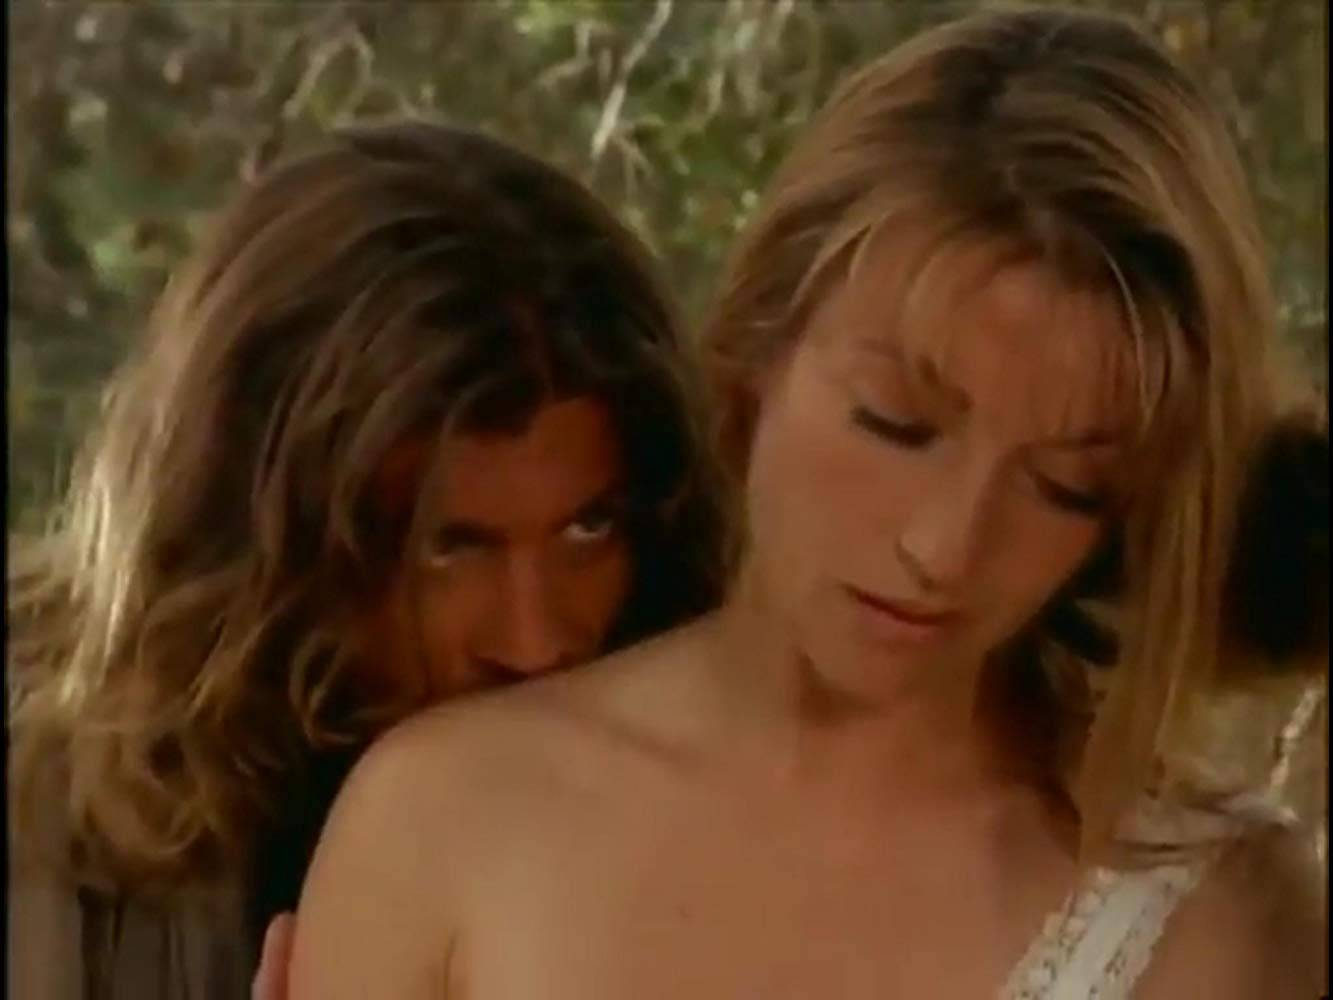 Dvadeset godina nakon: 'Žena vrač' ponovno grli svog Sullyja